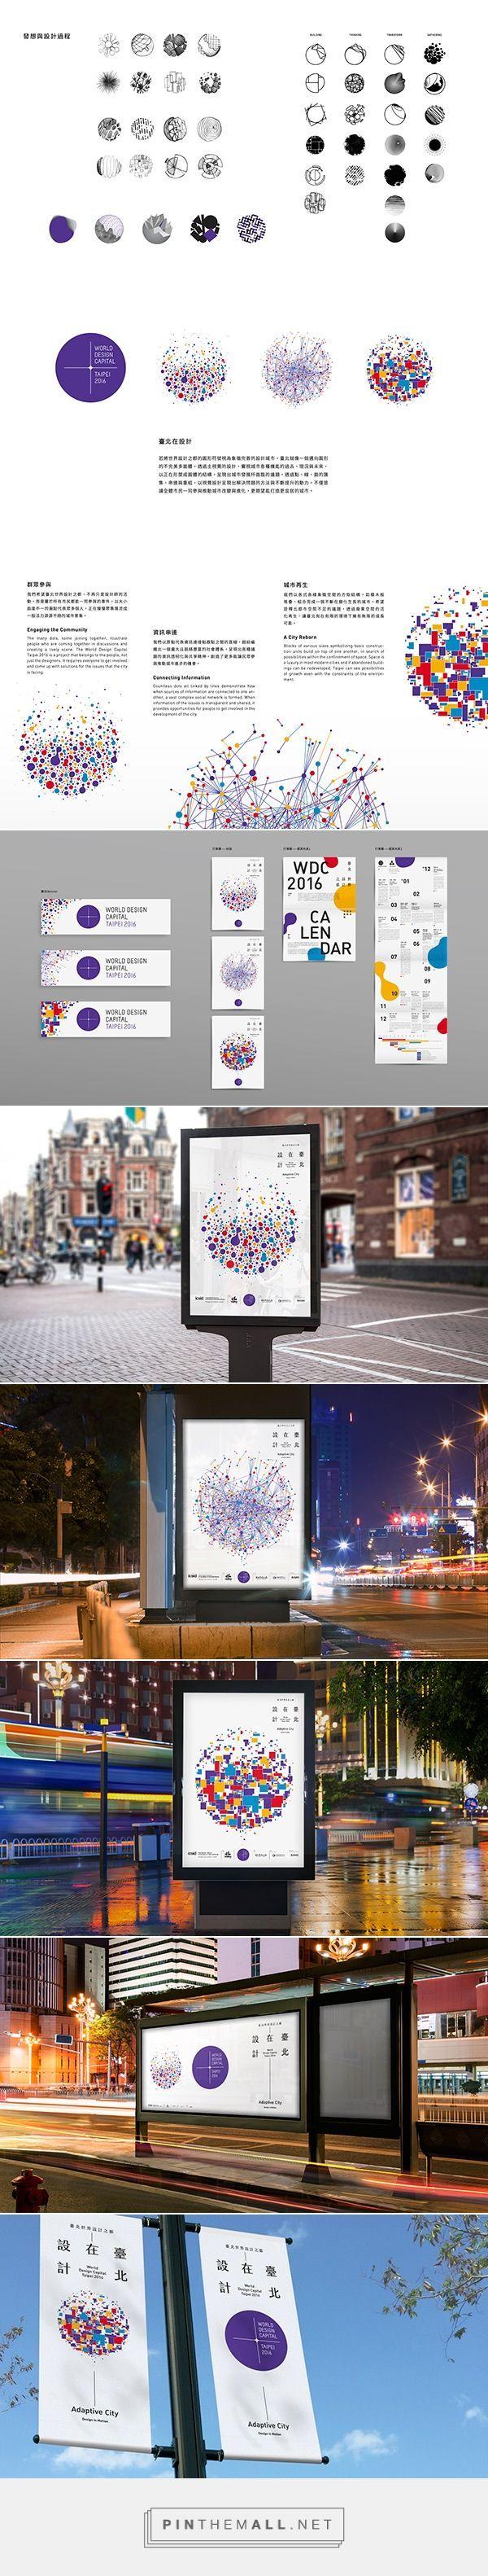 World Design Capital Taipei 2016 - Key Visual Design on Branding Served - created via https://pinthemall.net